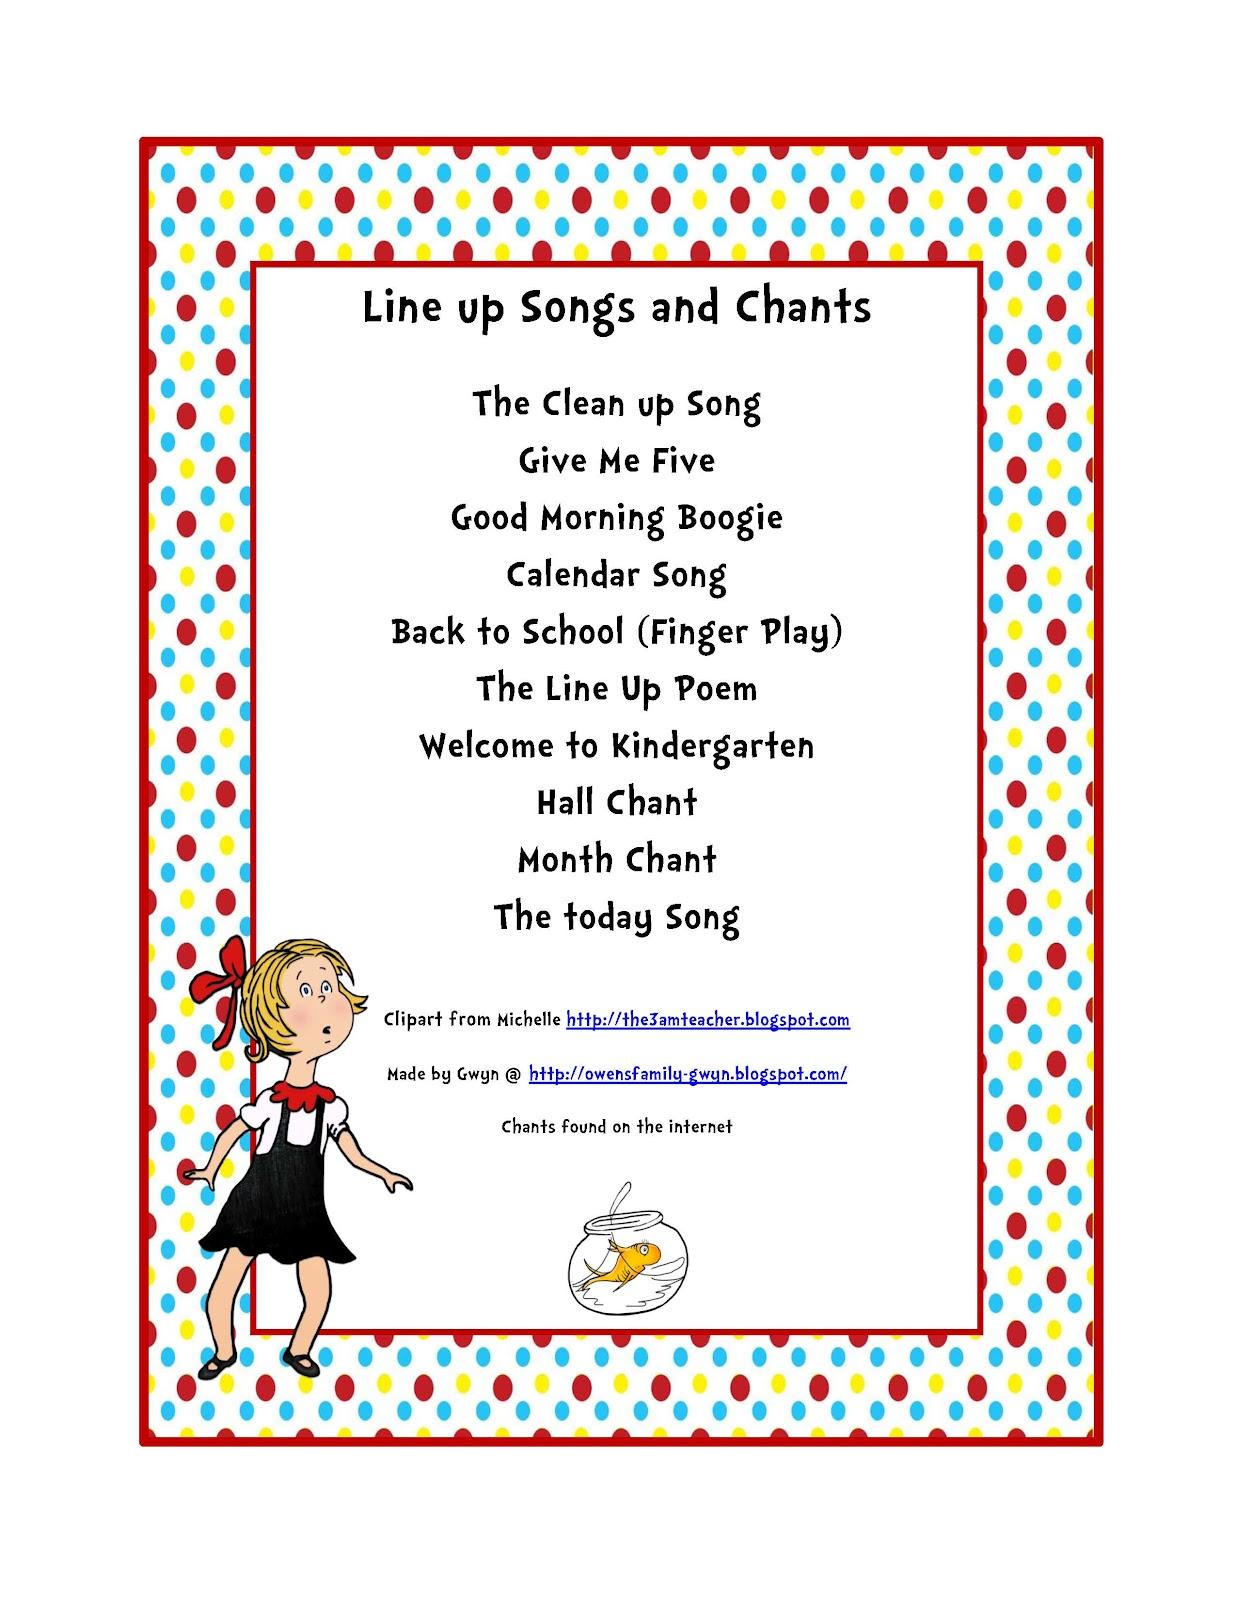 dr seuss songs preschool preschool printables july 2012 599